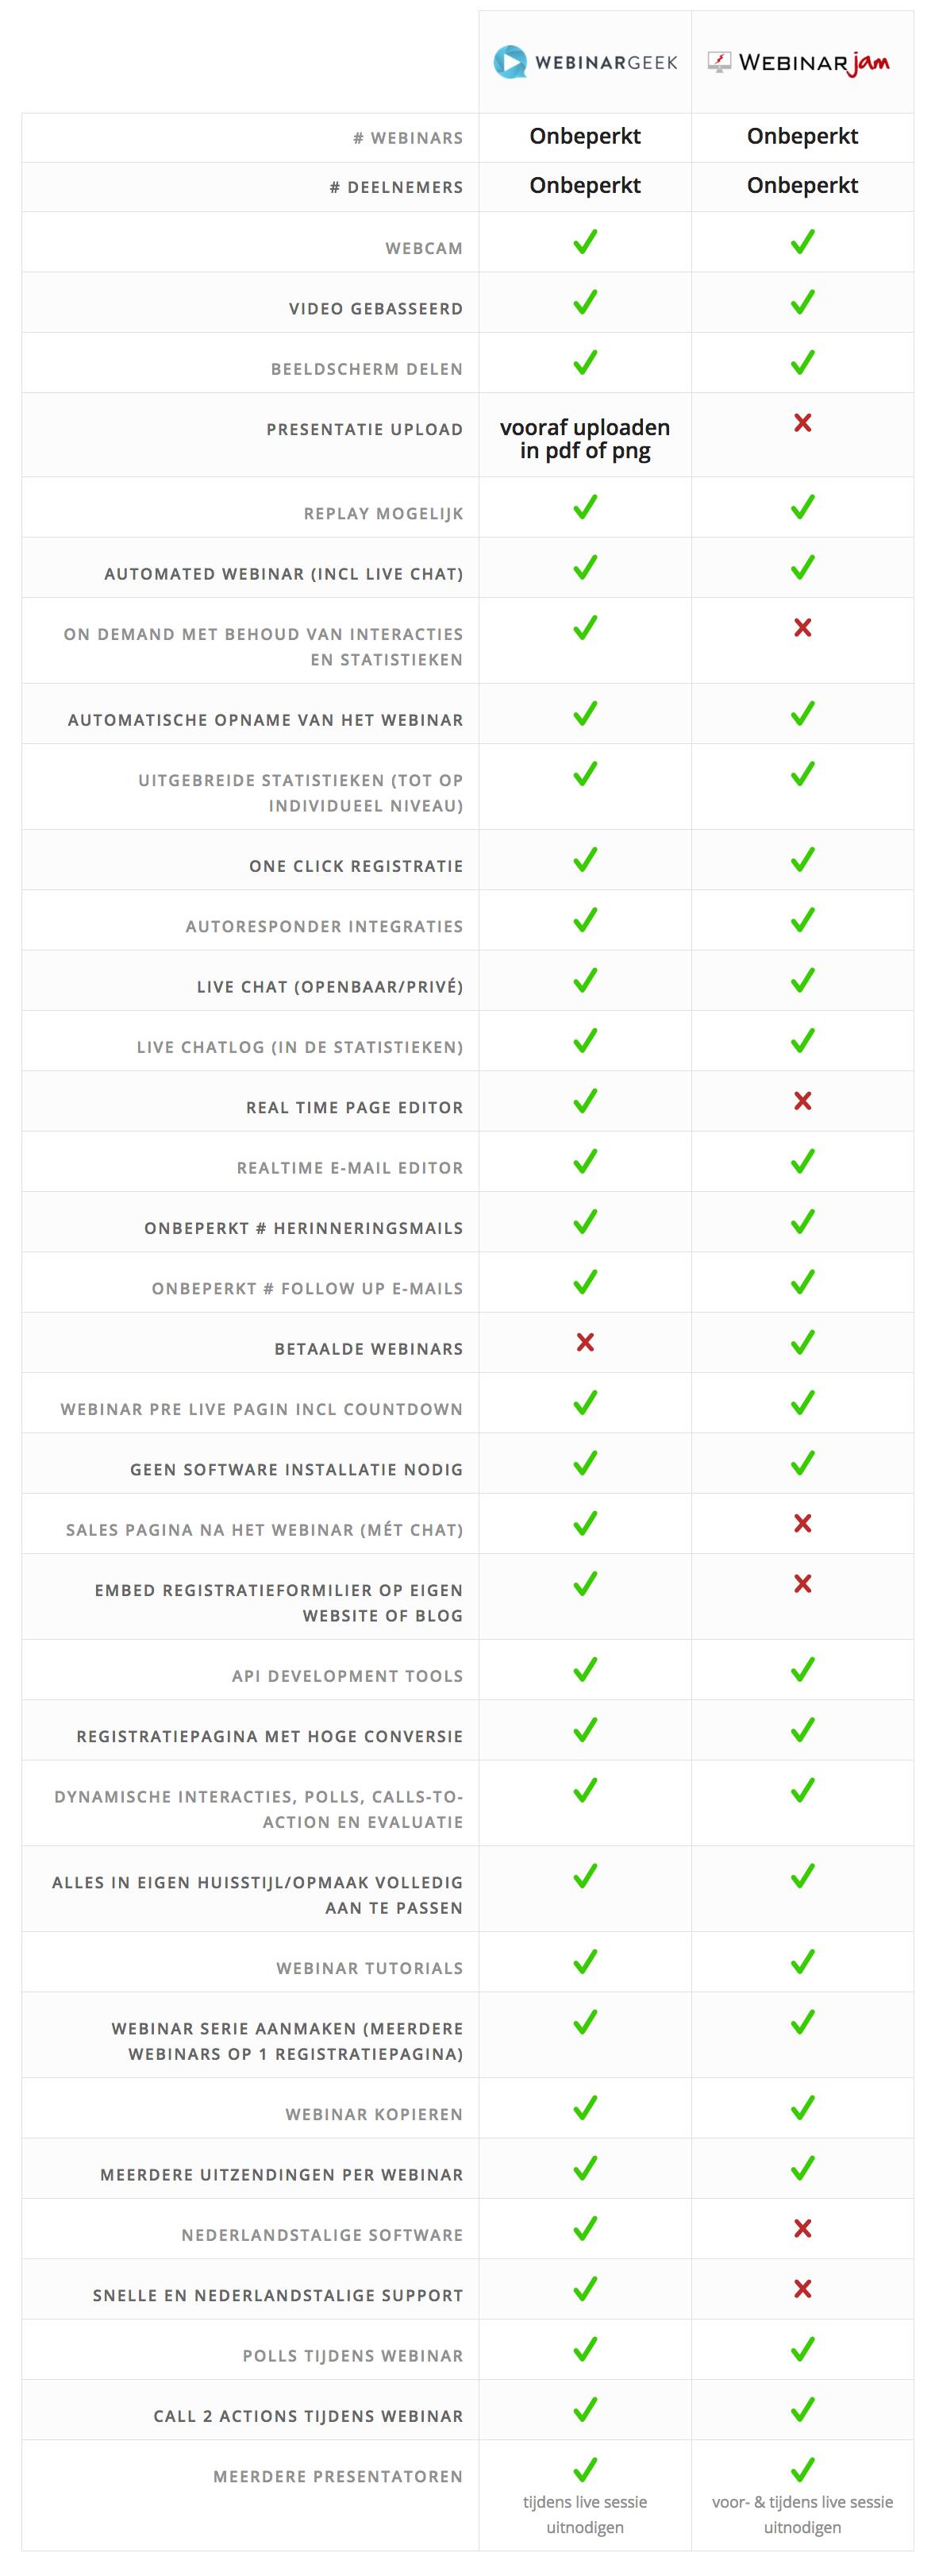 WebinarGeek versus WebinarJam